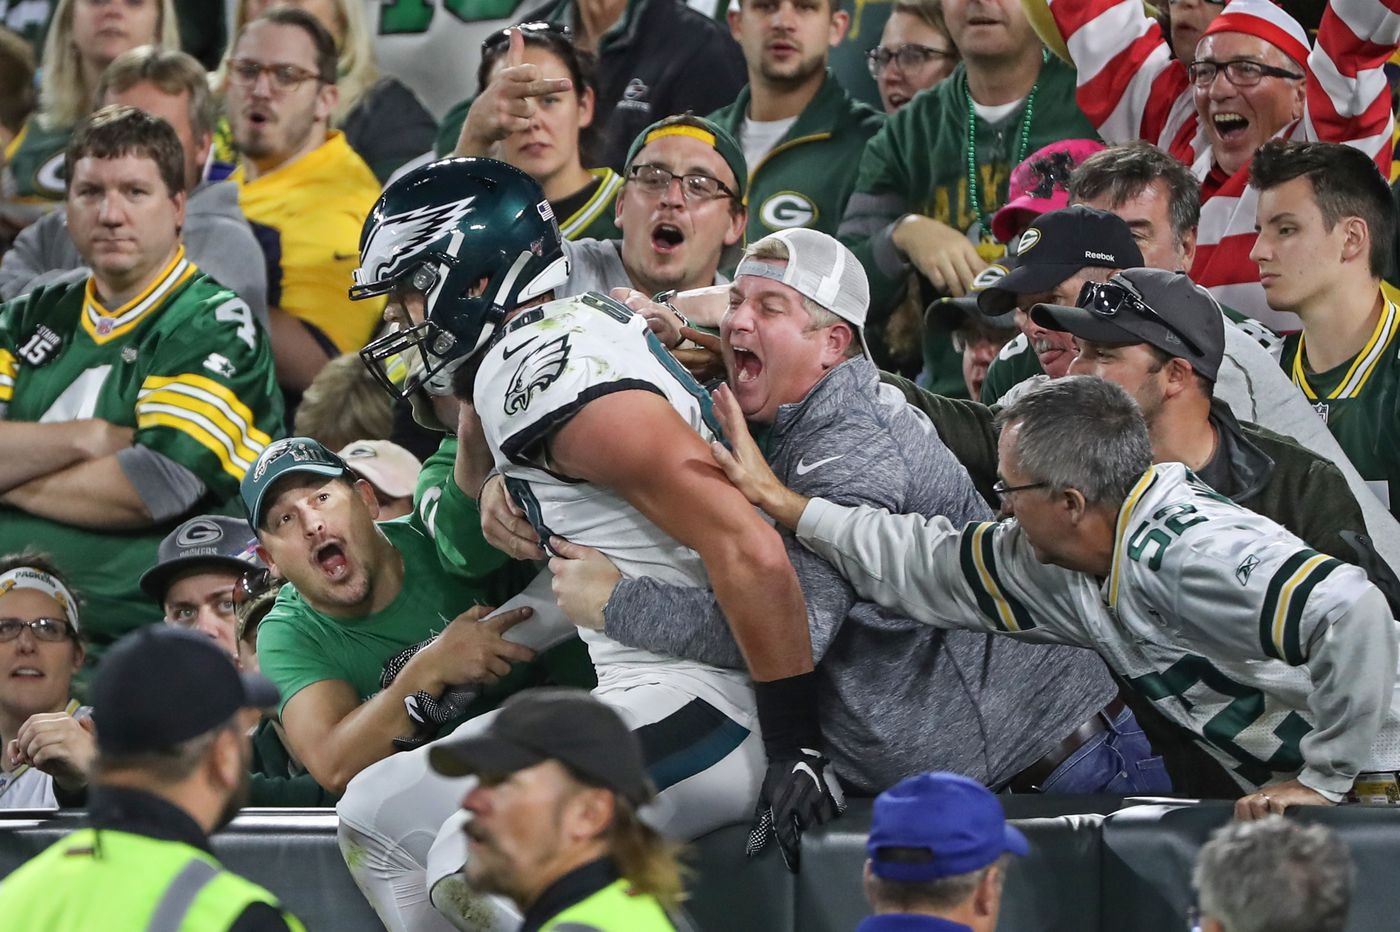 Eagles film breakdown: Dallas Goedert can block, but he still pines to catch